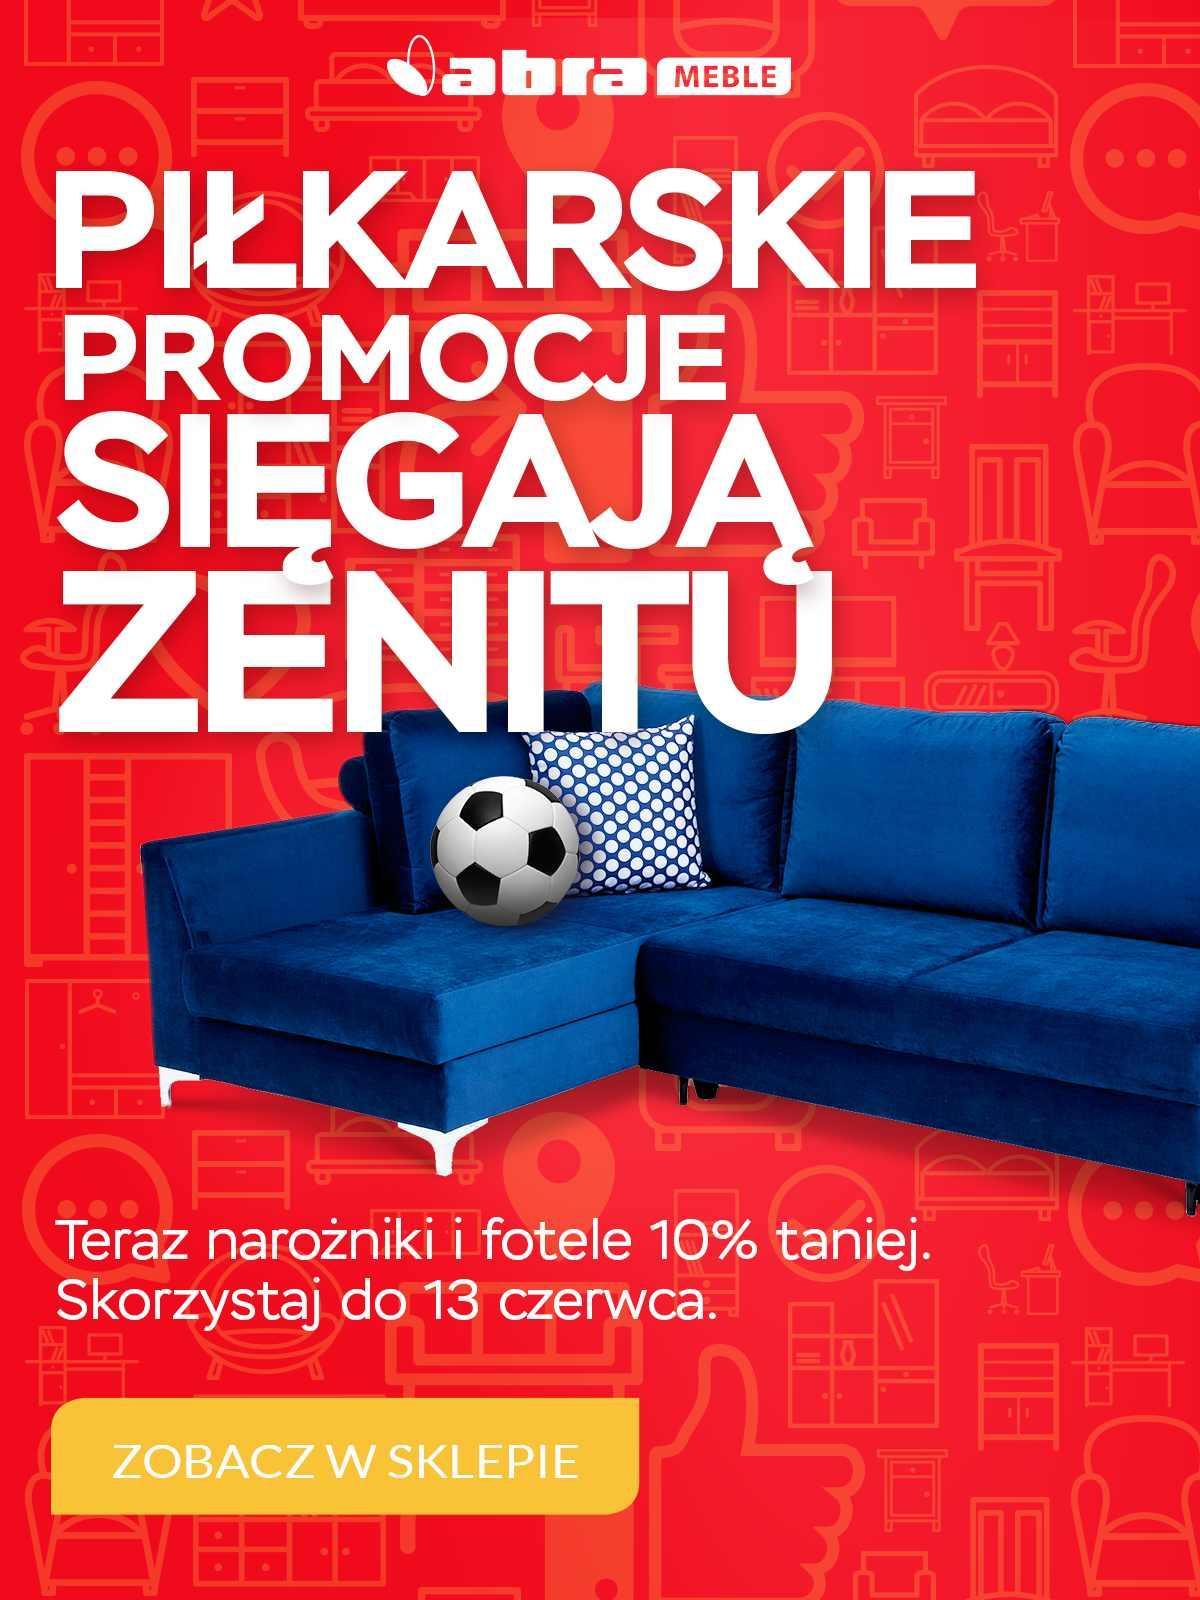 Gazetka promocyjna Abra Meble do 13/06/2018 str.0